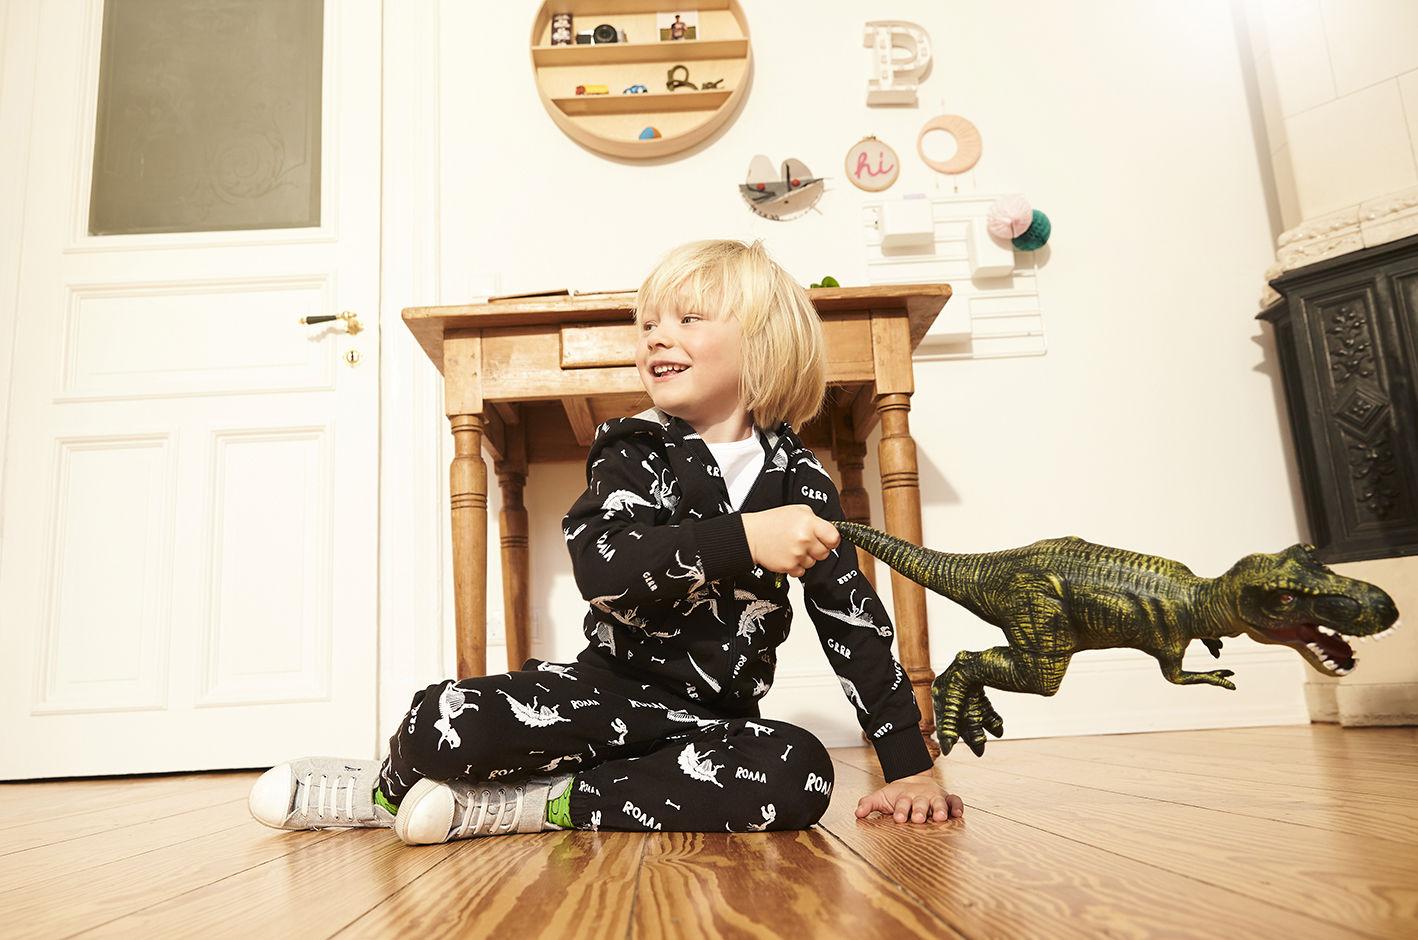 MIRIAM LINDTHALER C/O TOBIAS BOSCH FOTOMANAGEMENT FOTOGRAFIERT DIE AKTUELLE JAKO-O KAMPAGNE HERBST WINTER 2019